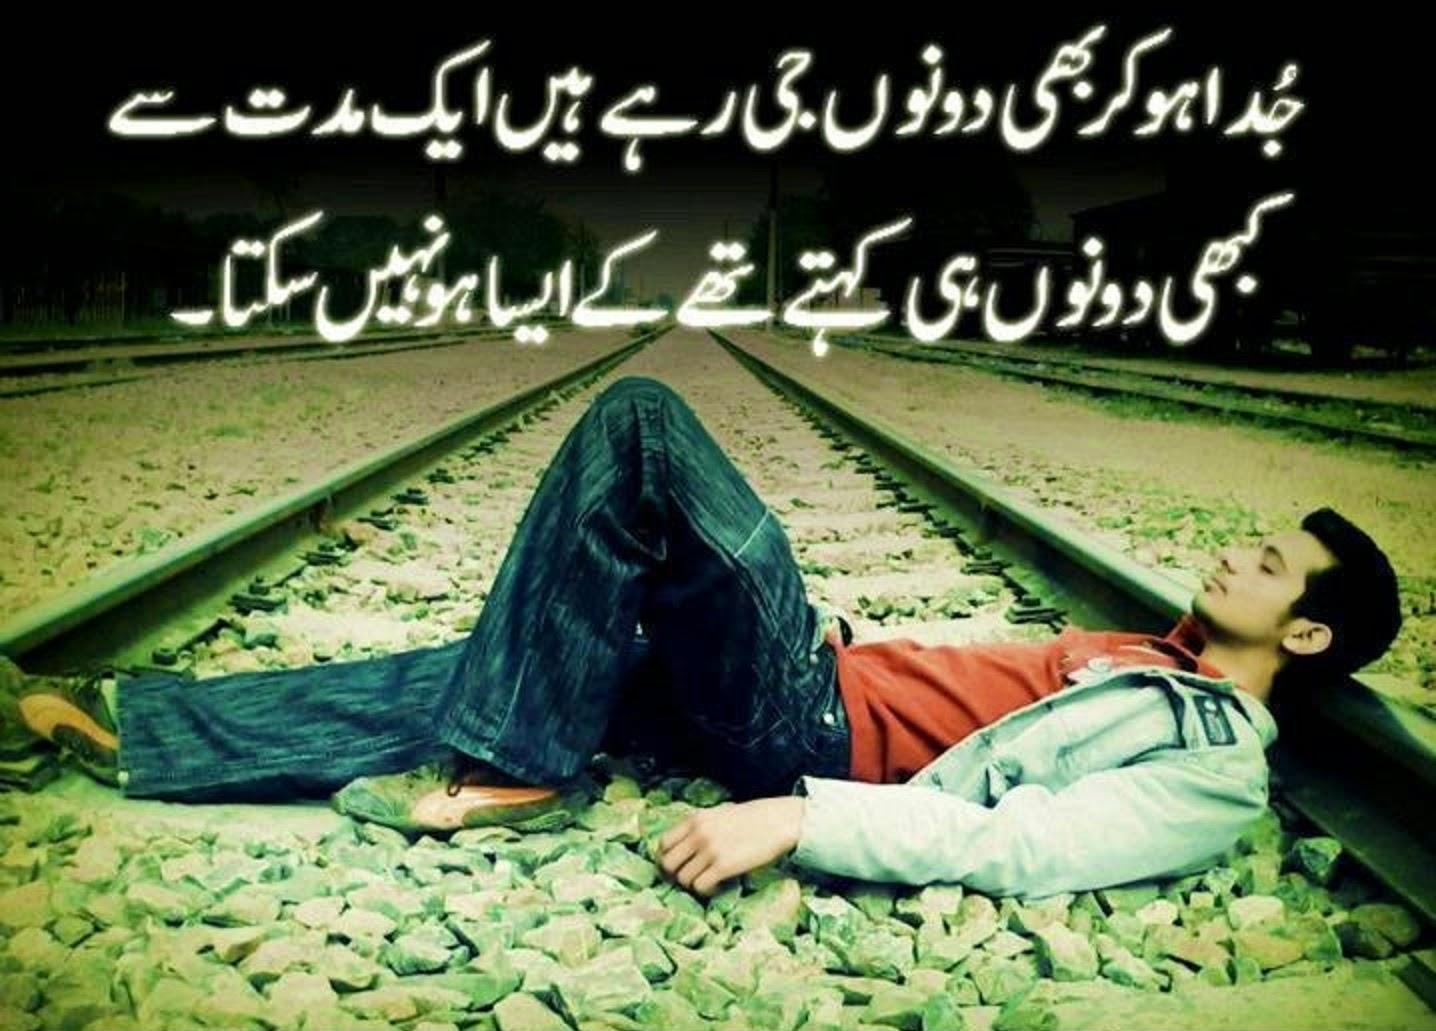 Download HD Wallpapers 3D Beautiful Sad Urdu Poetry HD 1436x1031